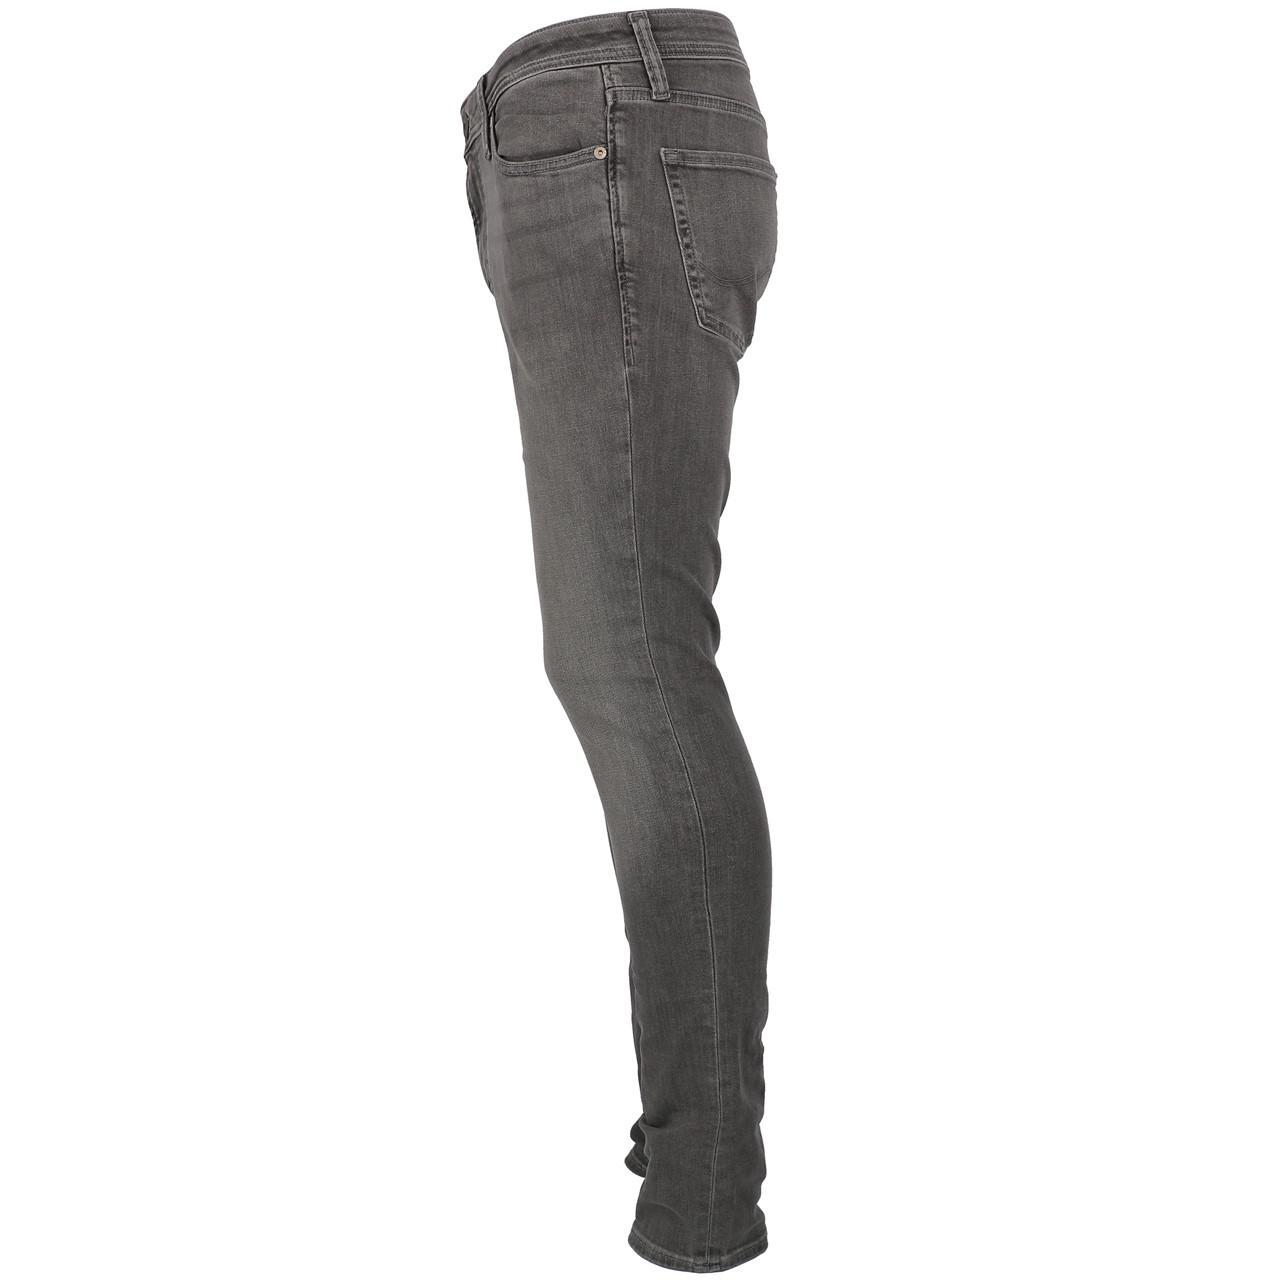 Jeans-Pants-Jack-and-Jones-Liam-32-Grey-Denim-Jeans-Grey-19911-New thumbnail 2